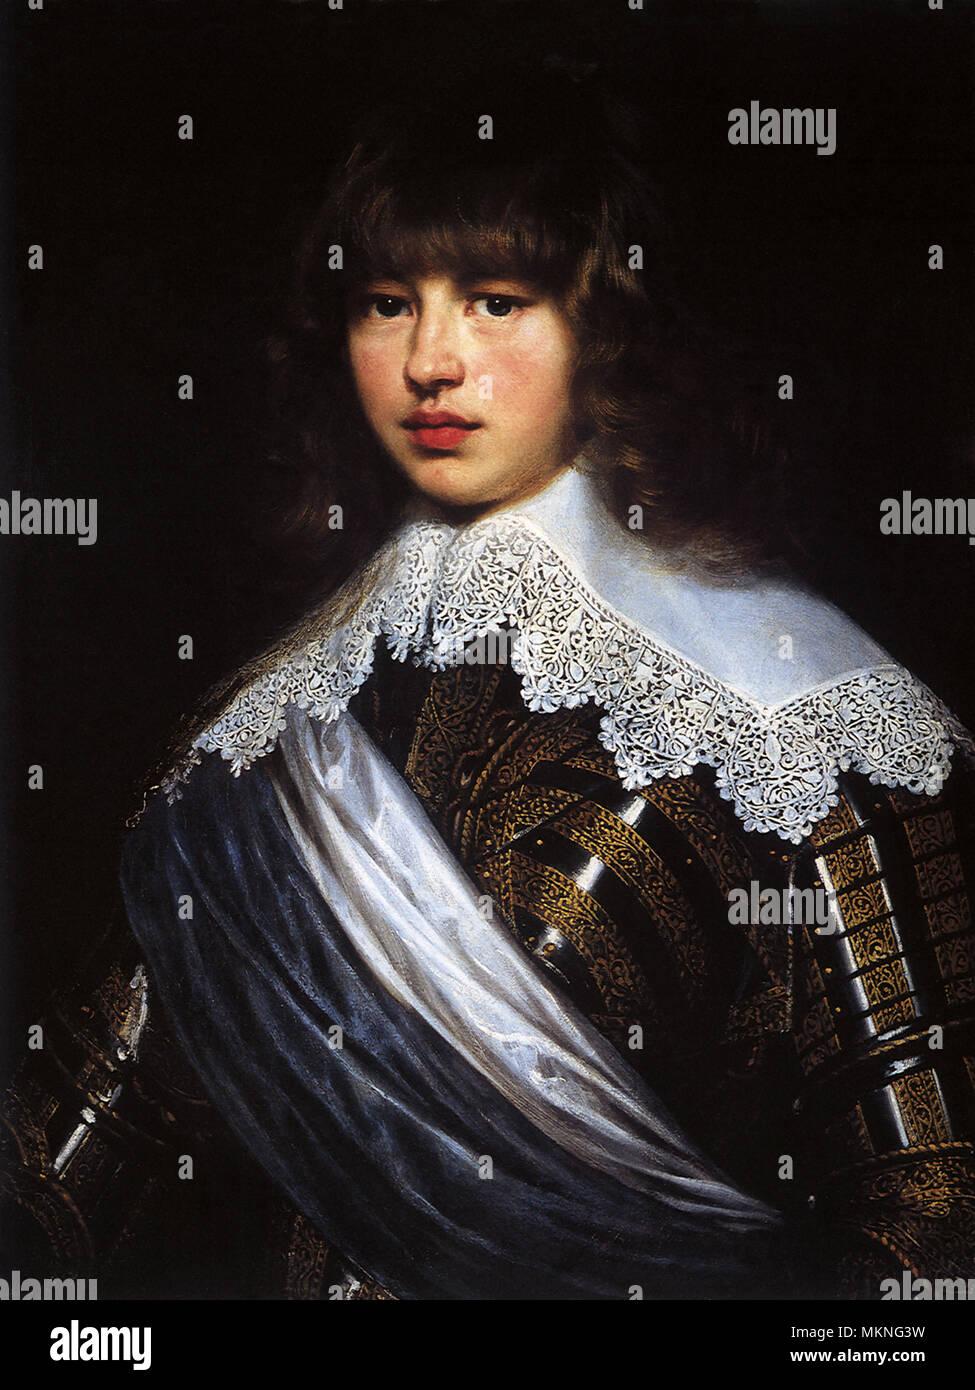 Portrait of Prince Waldemar Christian of Denmark 1622 - Stock Image